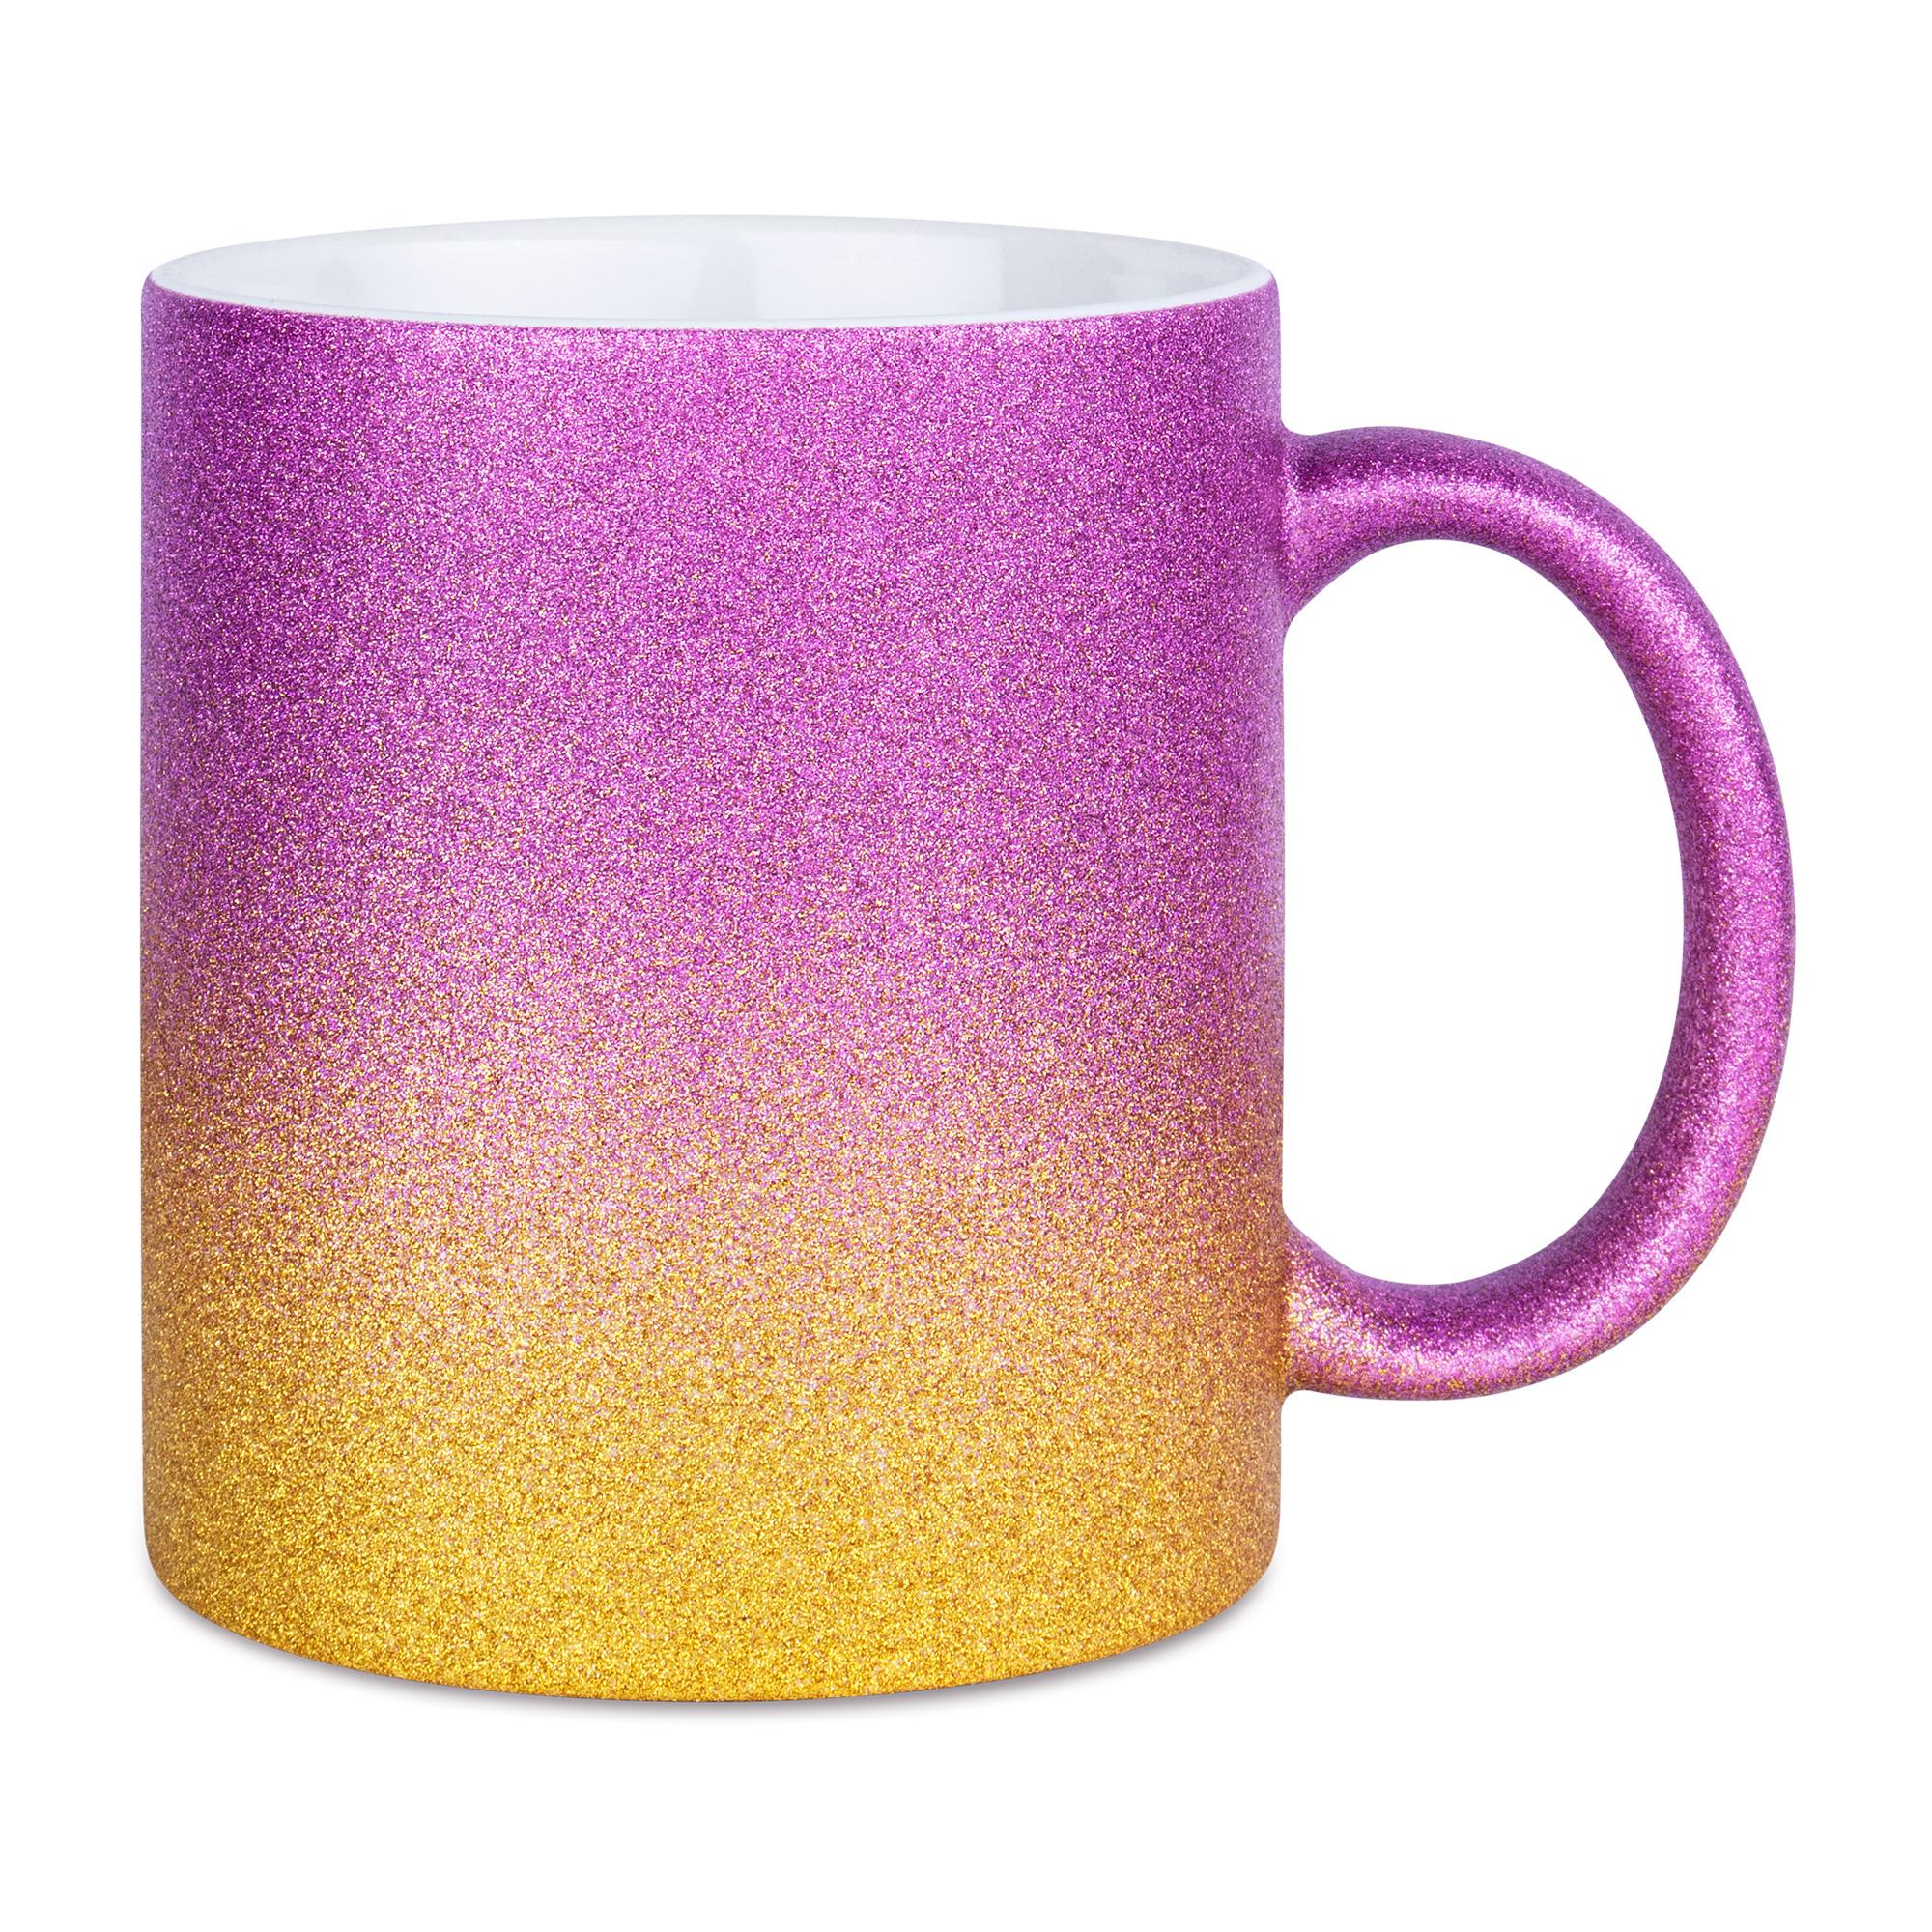 Sparkle Gradient mugg, PurpleGold